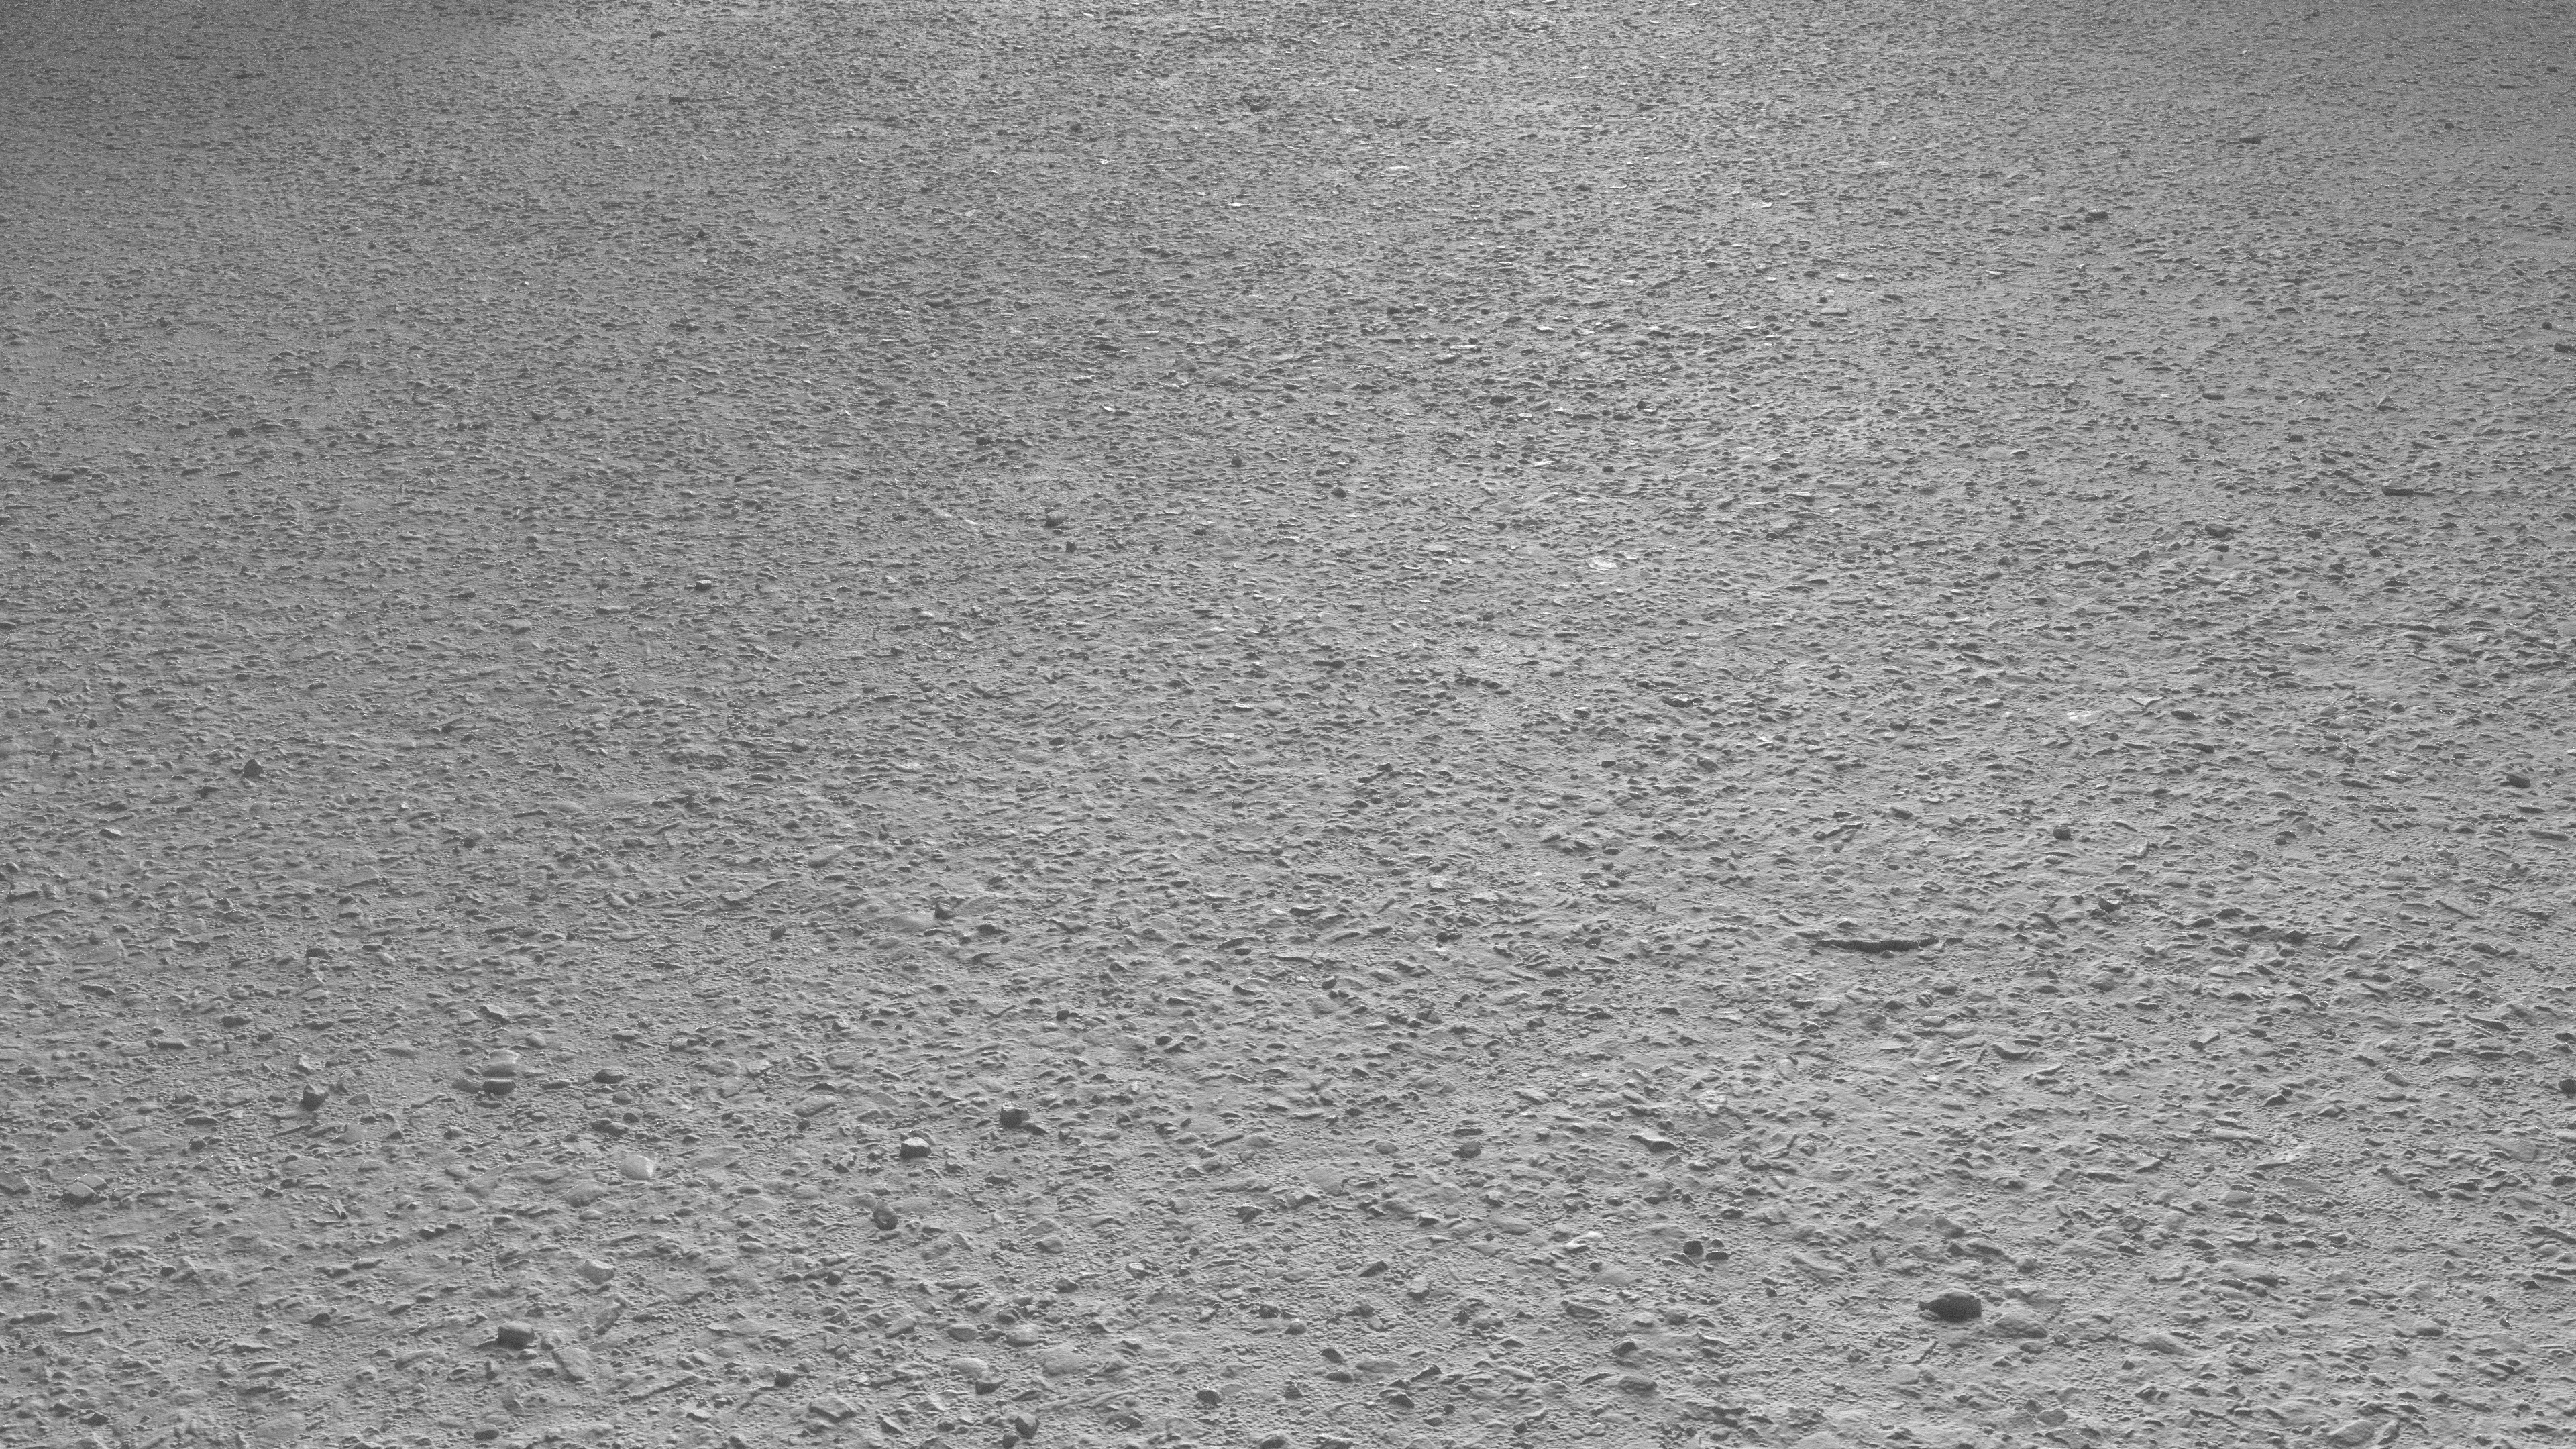 3d Scanned Rough Concrete 3x3 Meters